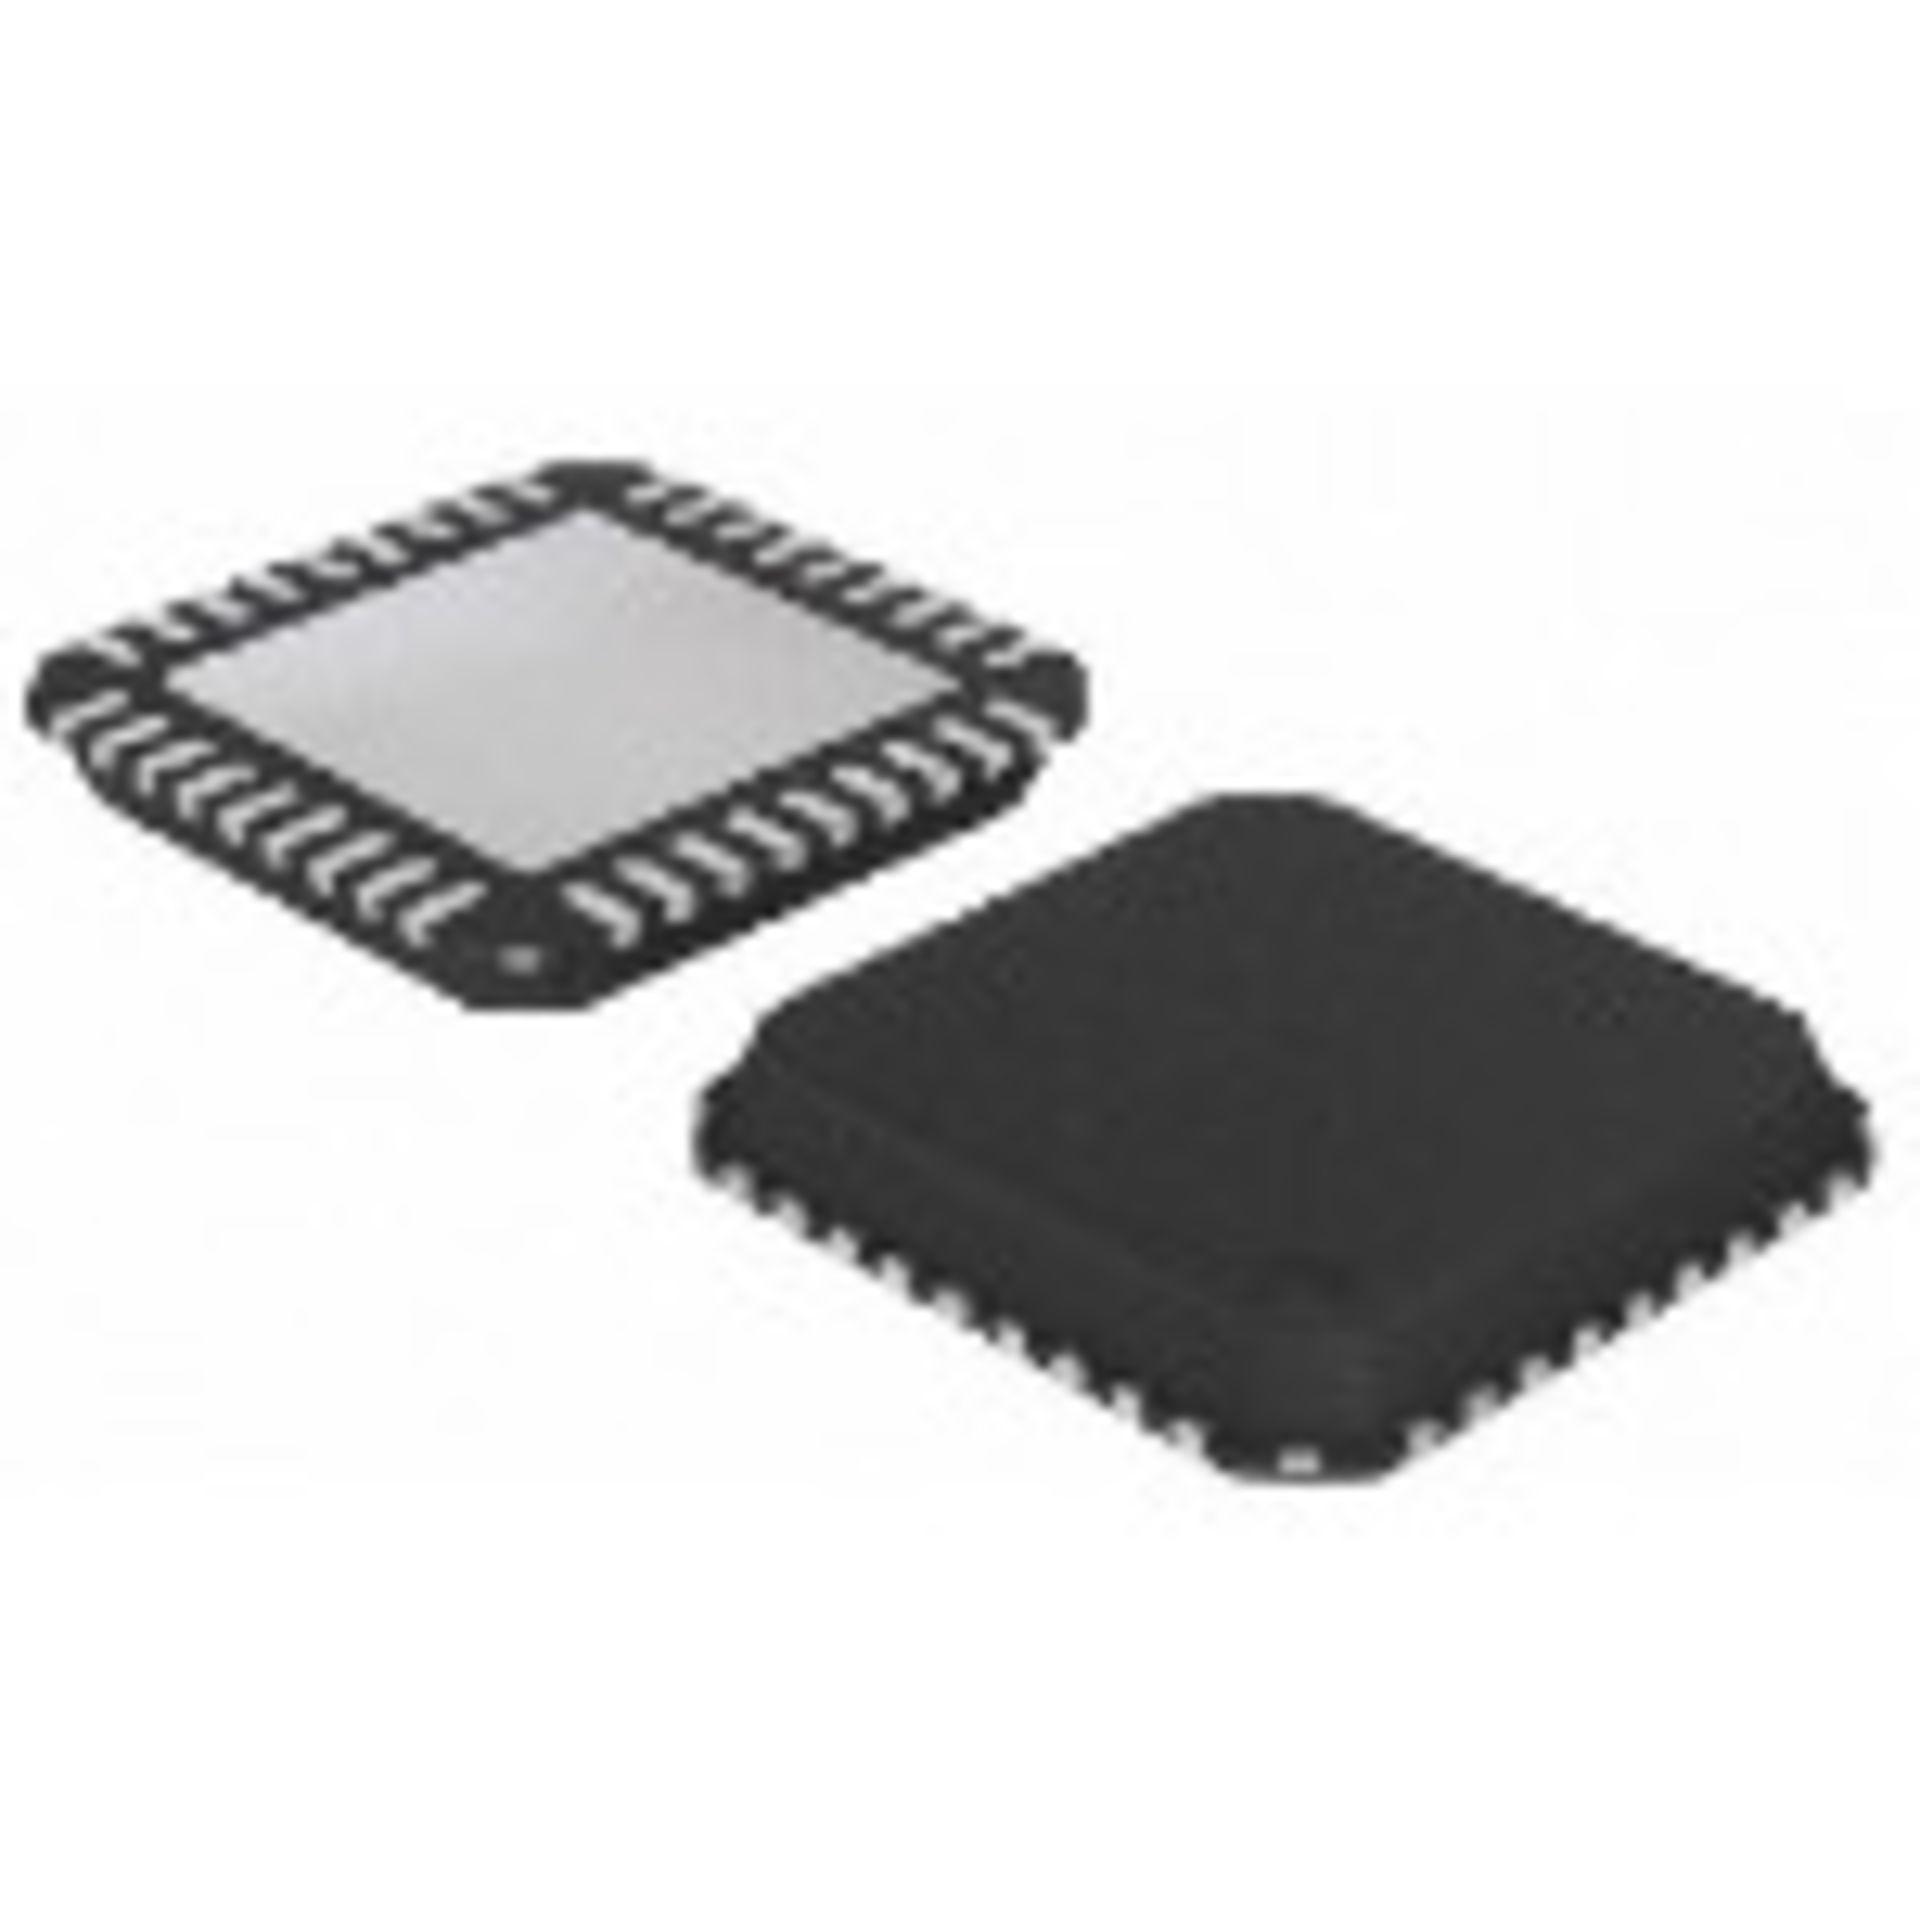 Microchip Technology USB2241I-AEZG-05 USB Interface IC's, Full Speed/High Speed Multi Format SD/